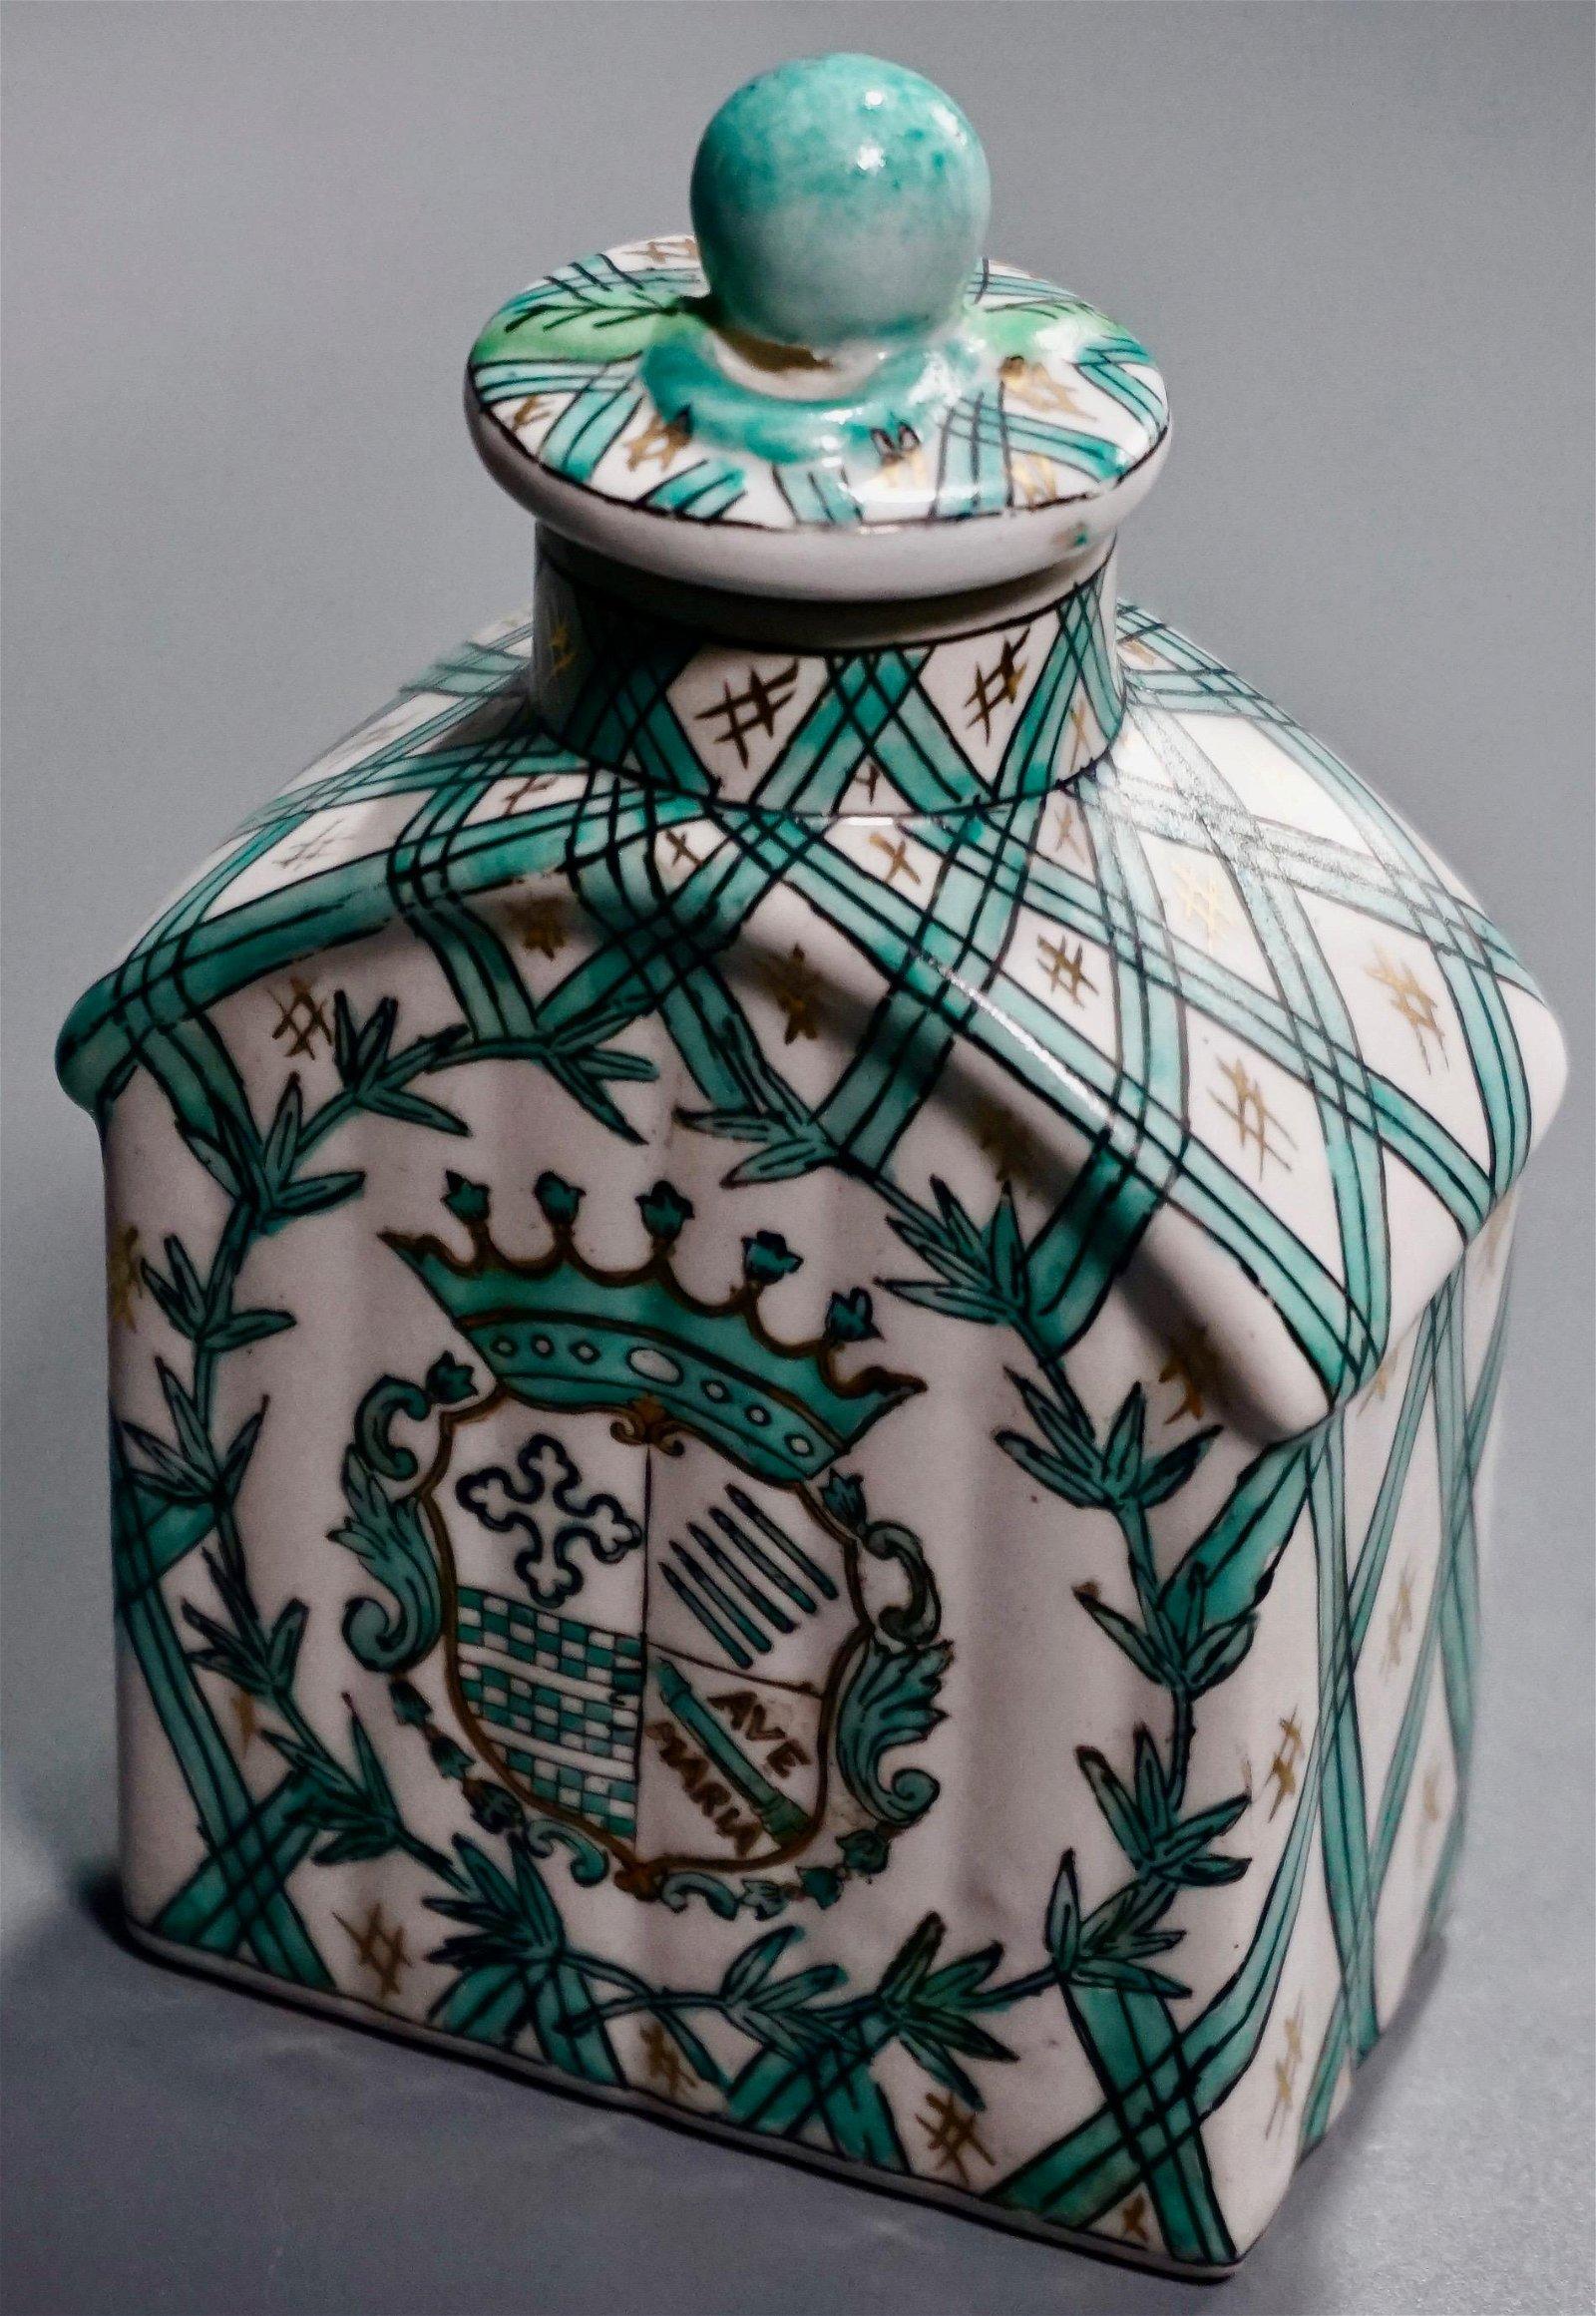 Ave Maria Crest Hand Painted Tea Caddy Flagon